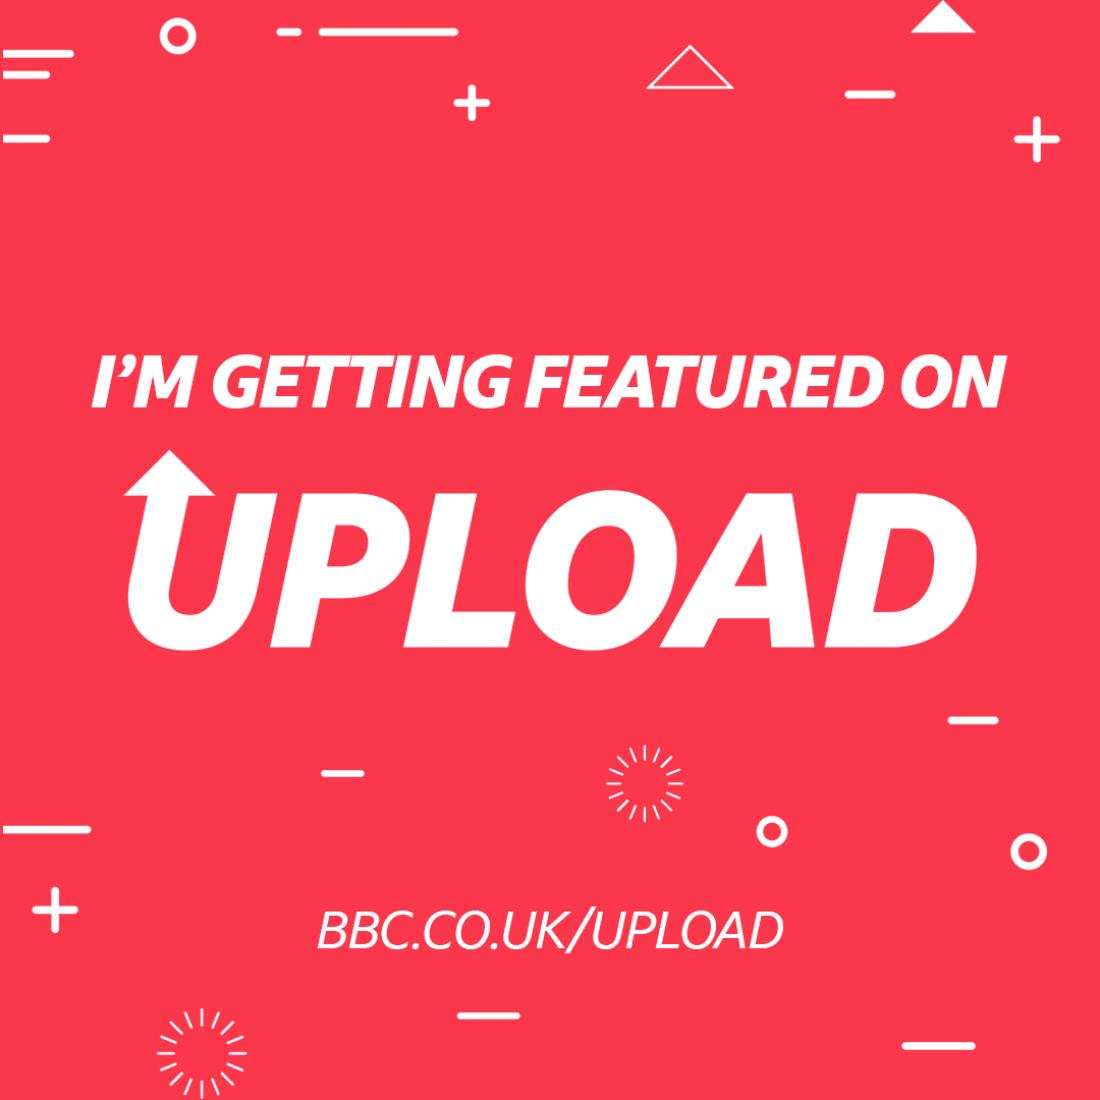 BBC UPLOAD